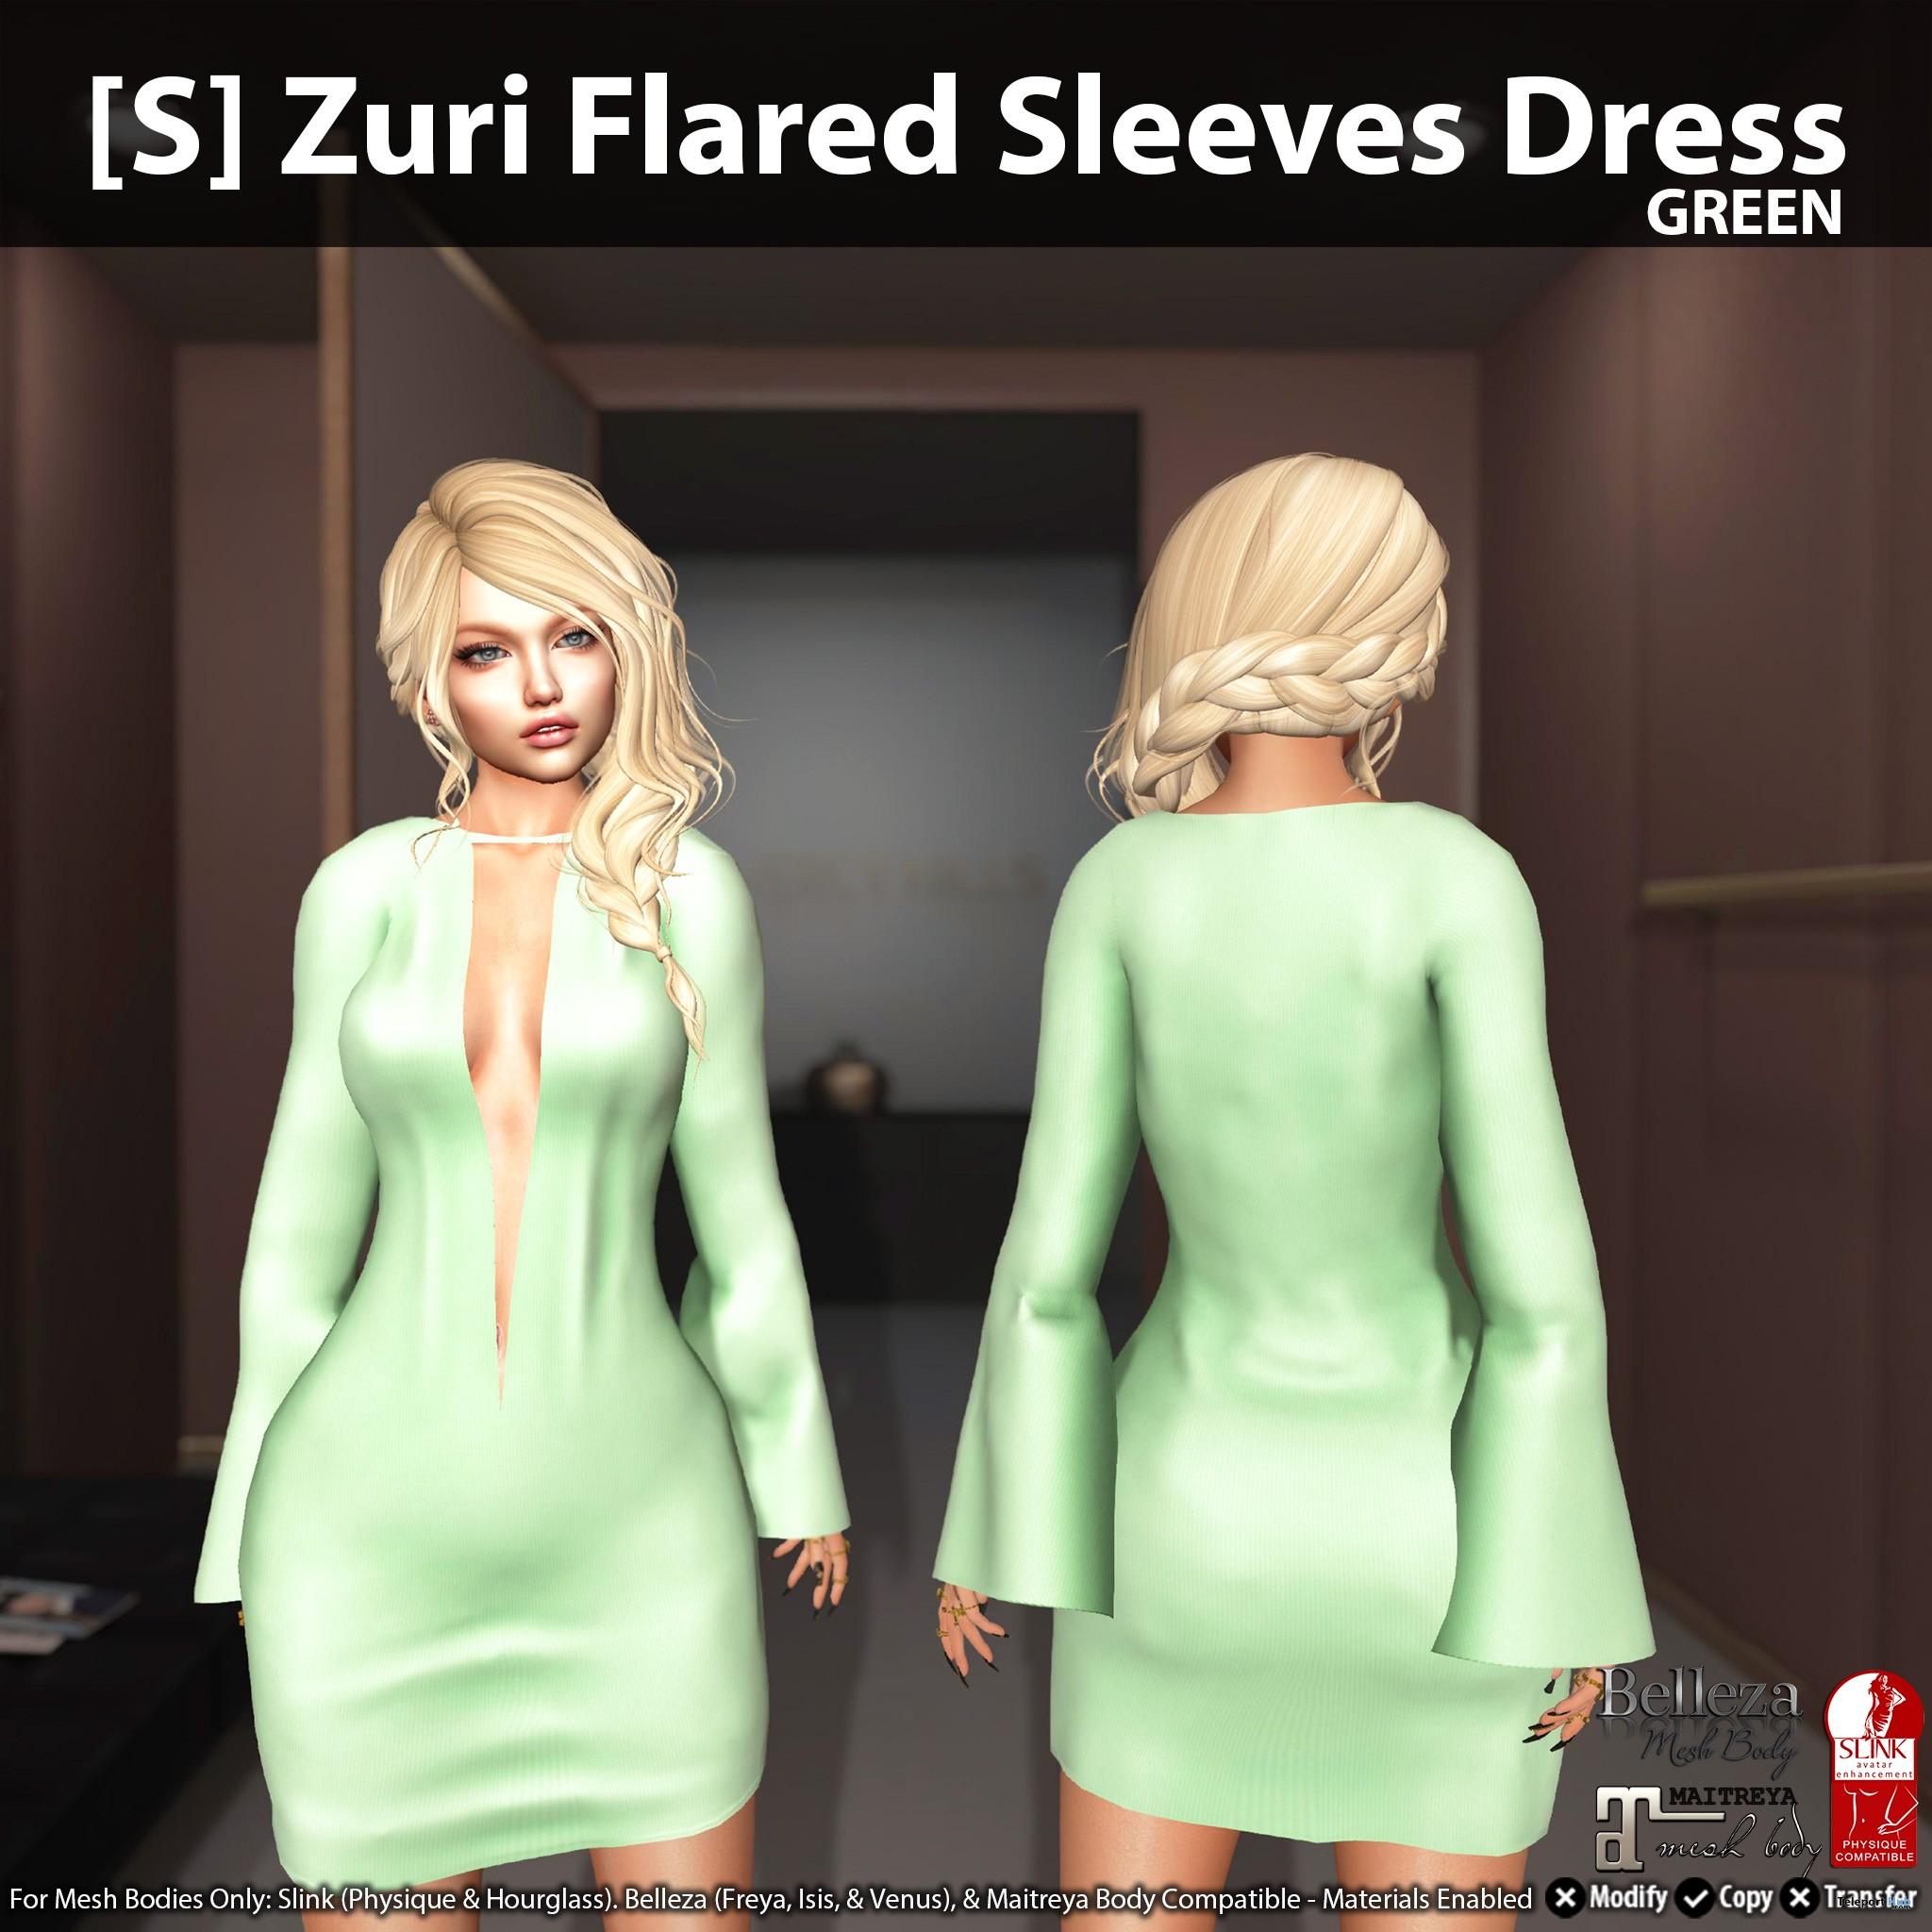 New Release: [S] Aarona Belted Jacket & Skirt by [satus Inc] - Teleport Hub - teleporthub.com